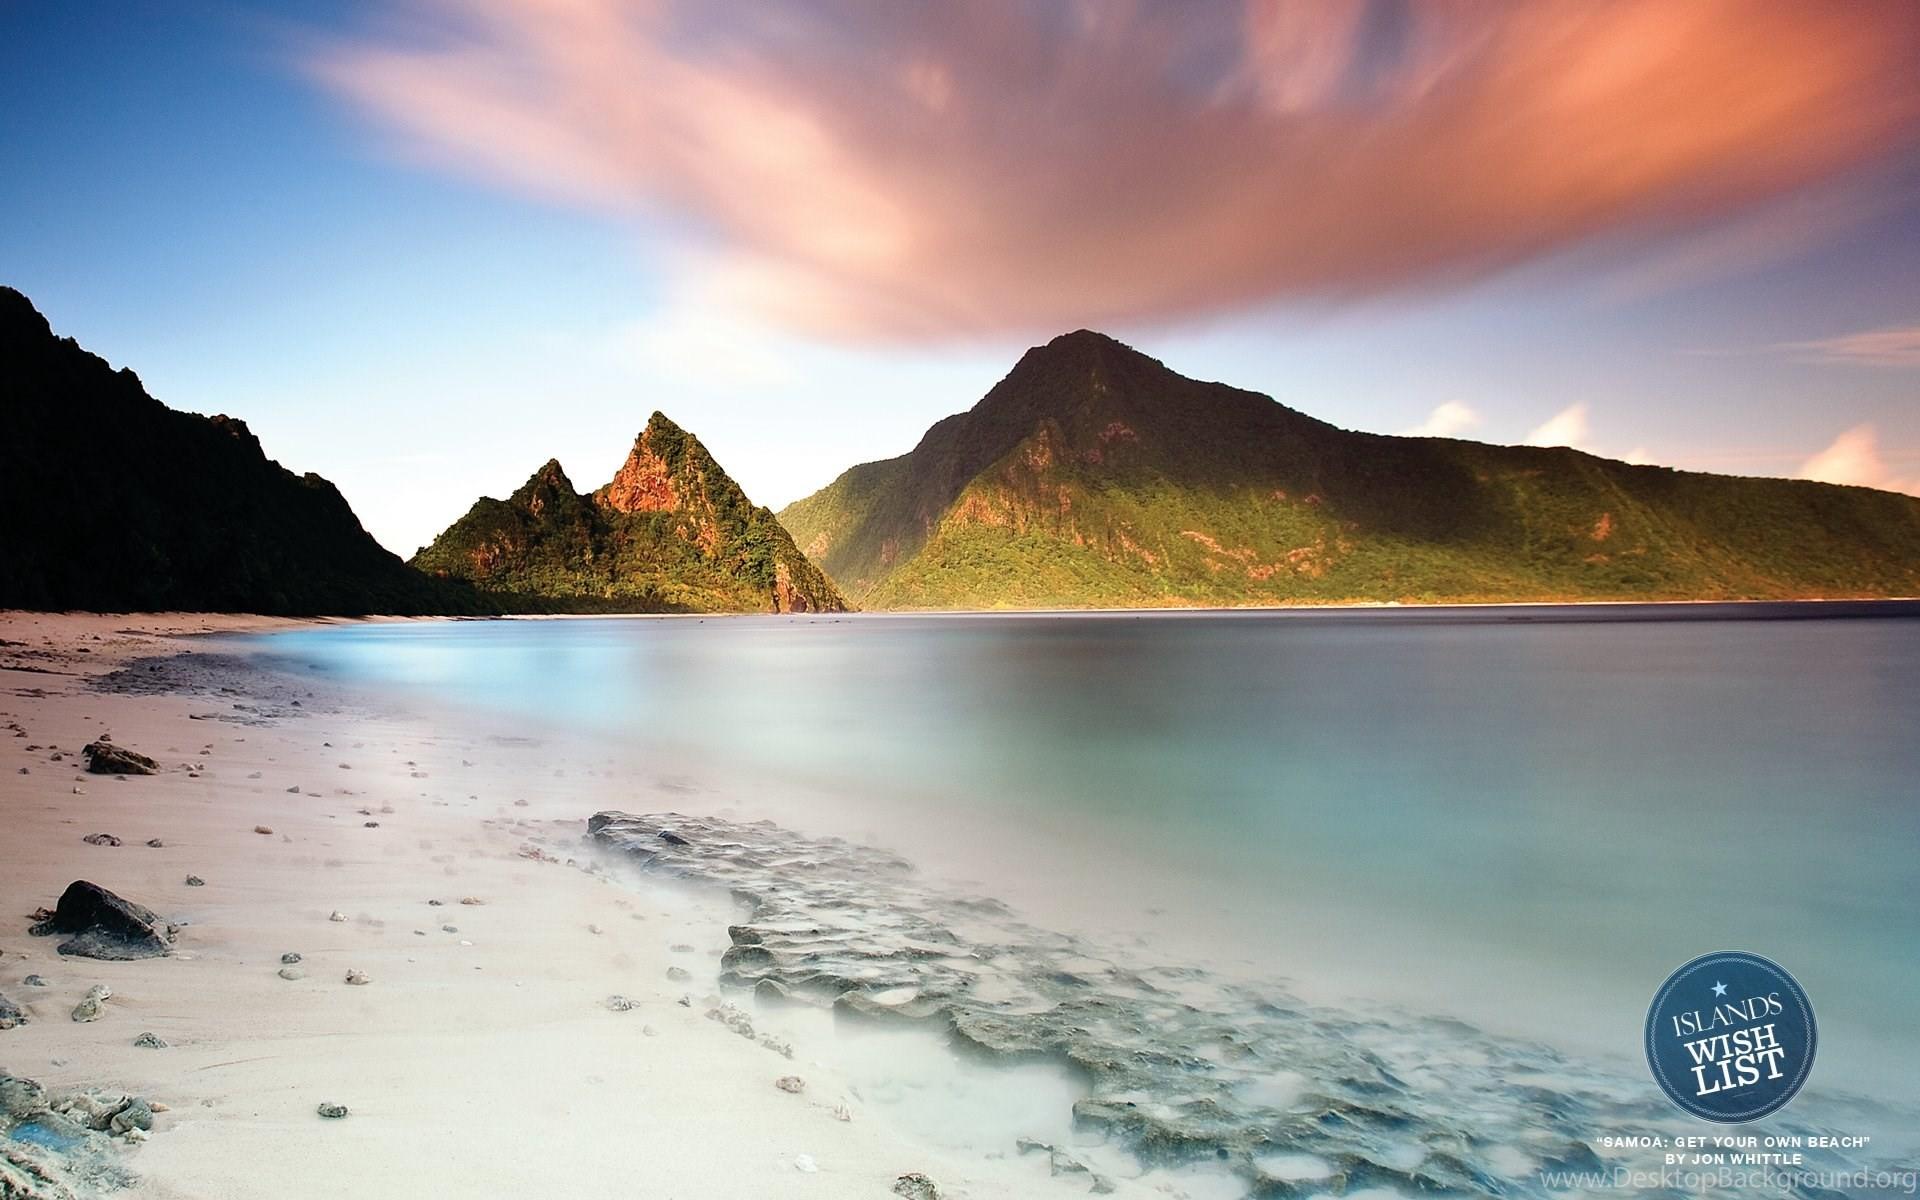 Samoan Wallpapers Samoa Zone Source